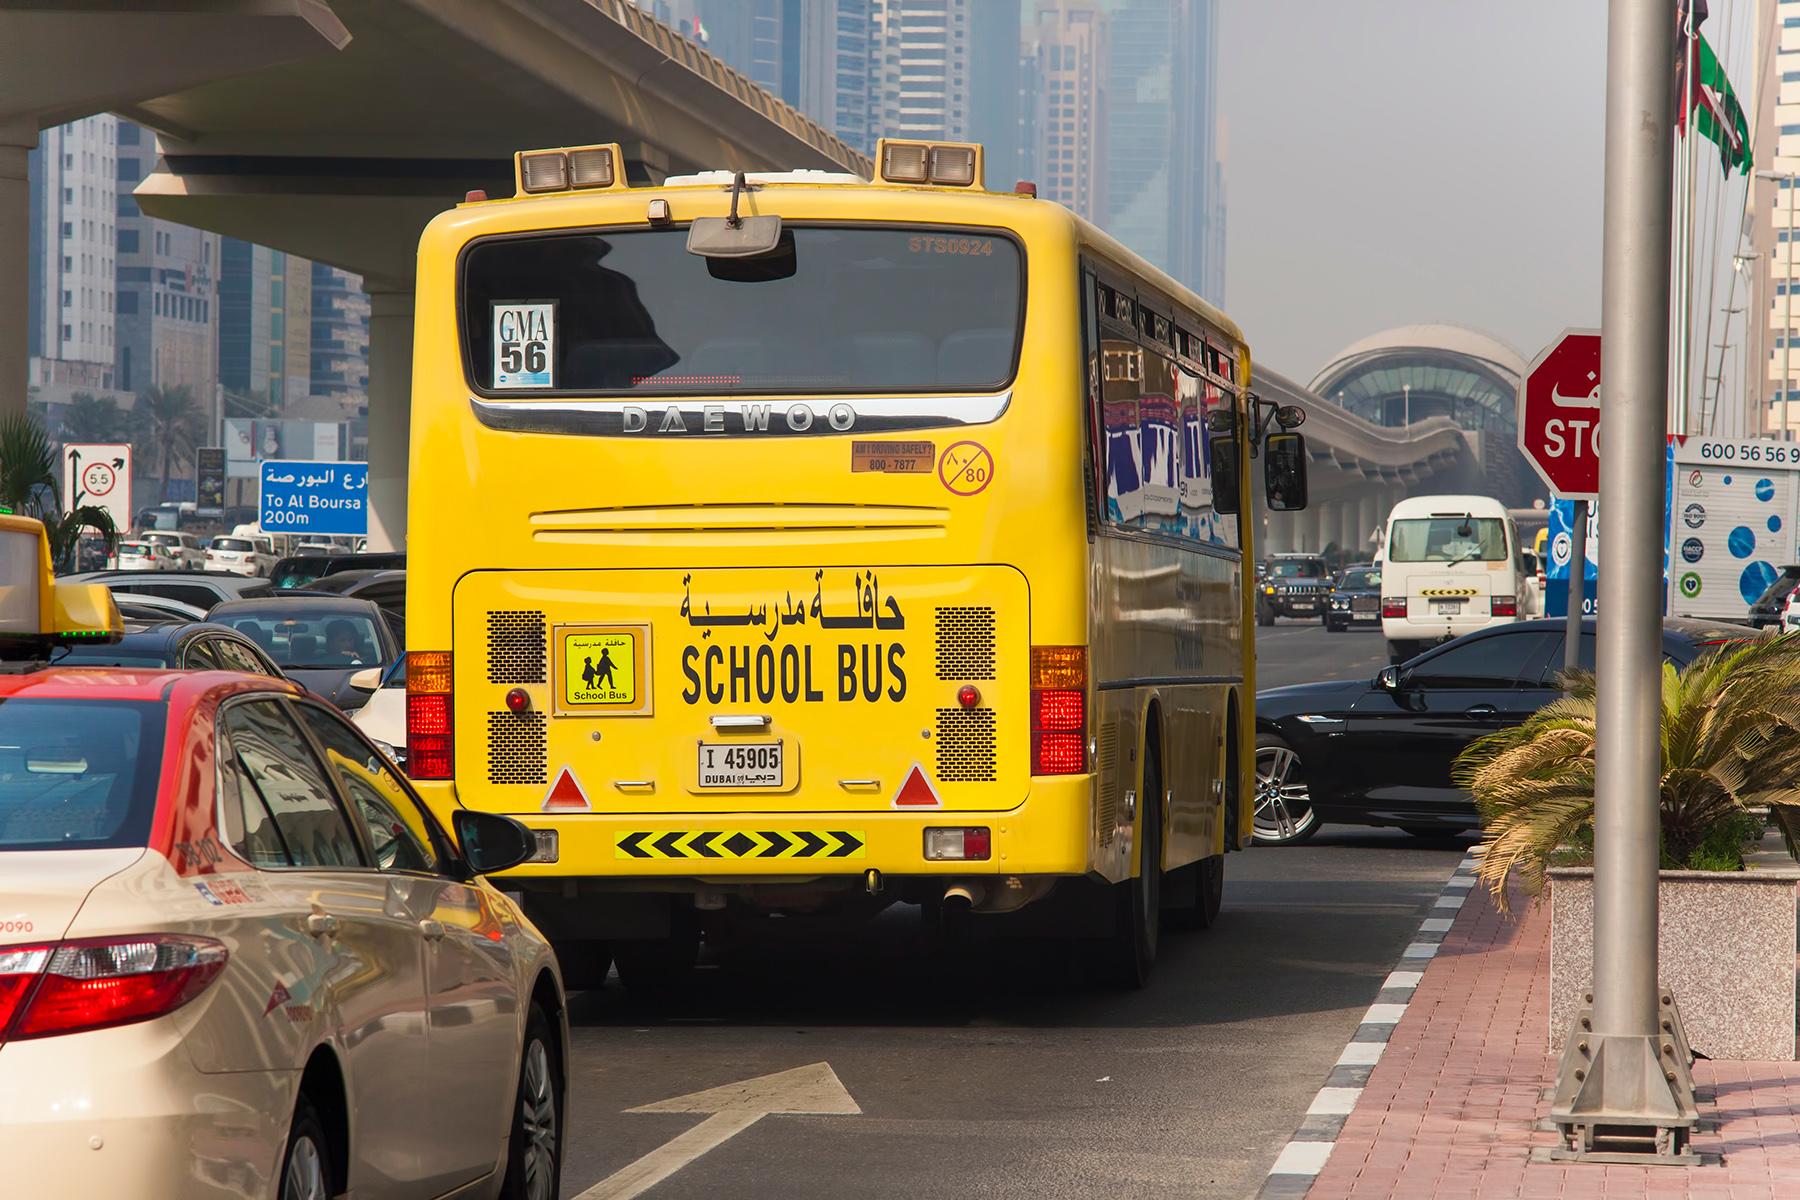 School bus in Dubai traffic